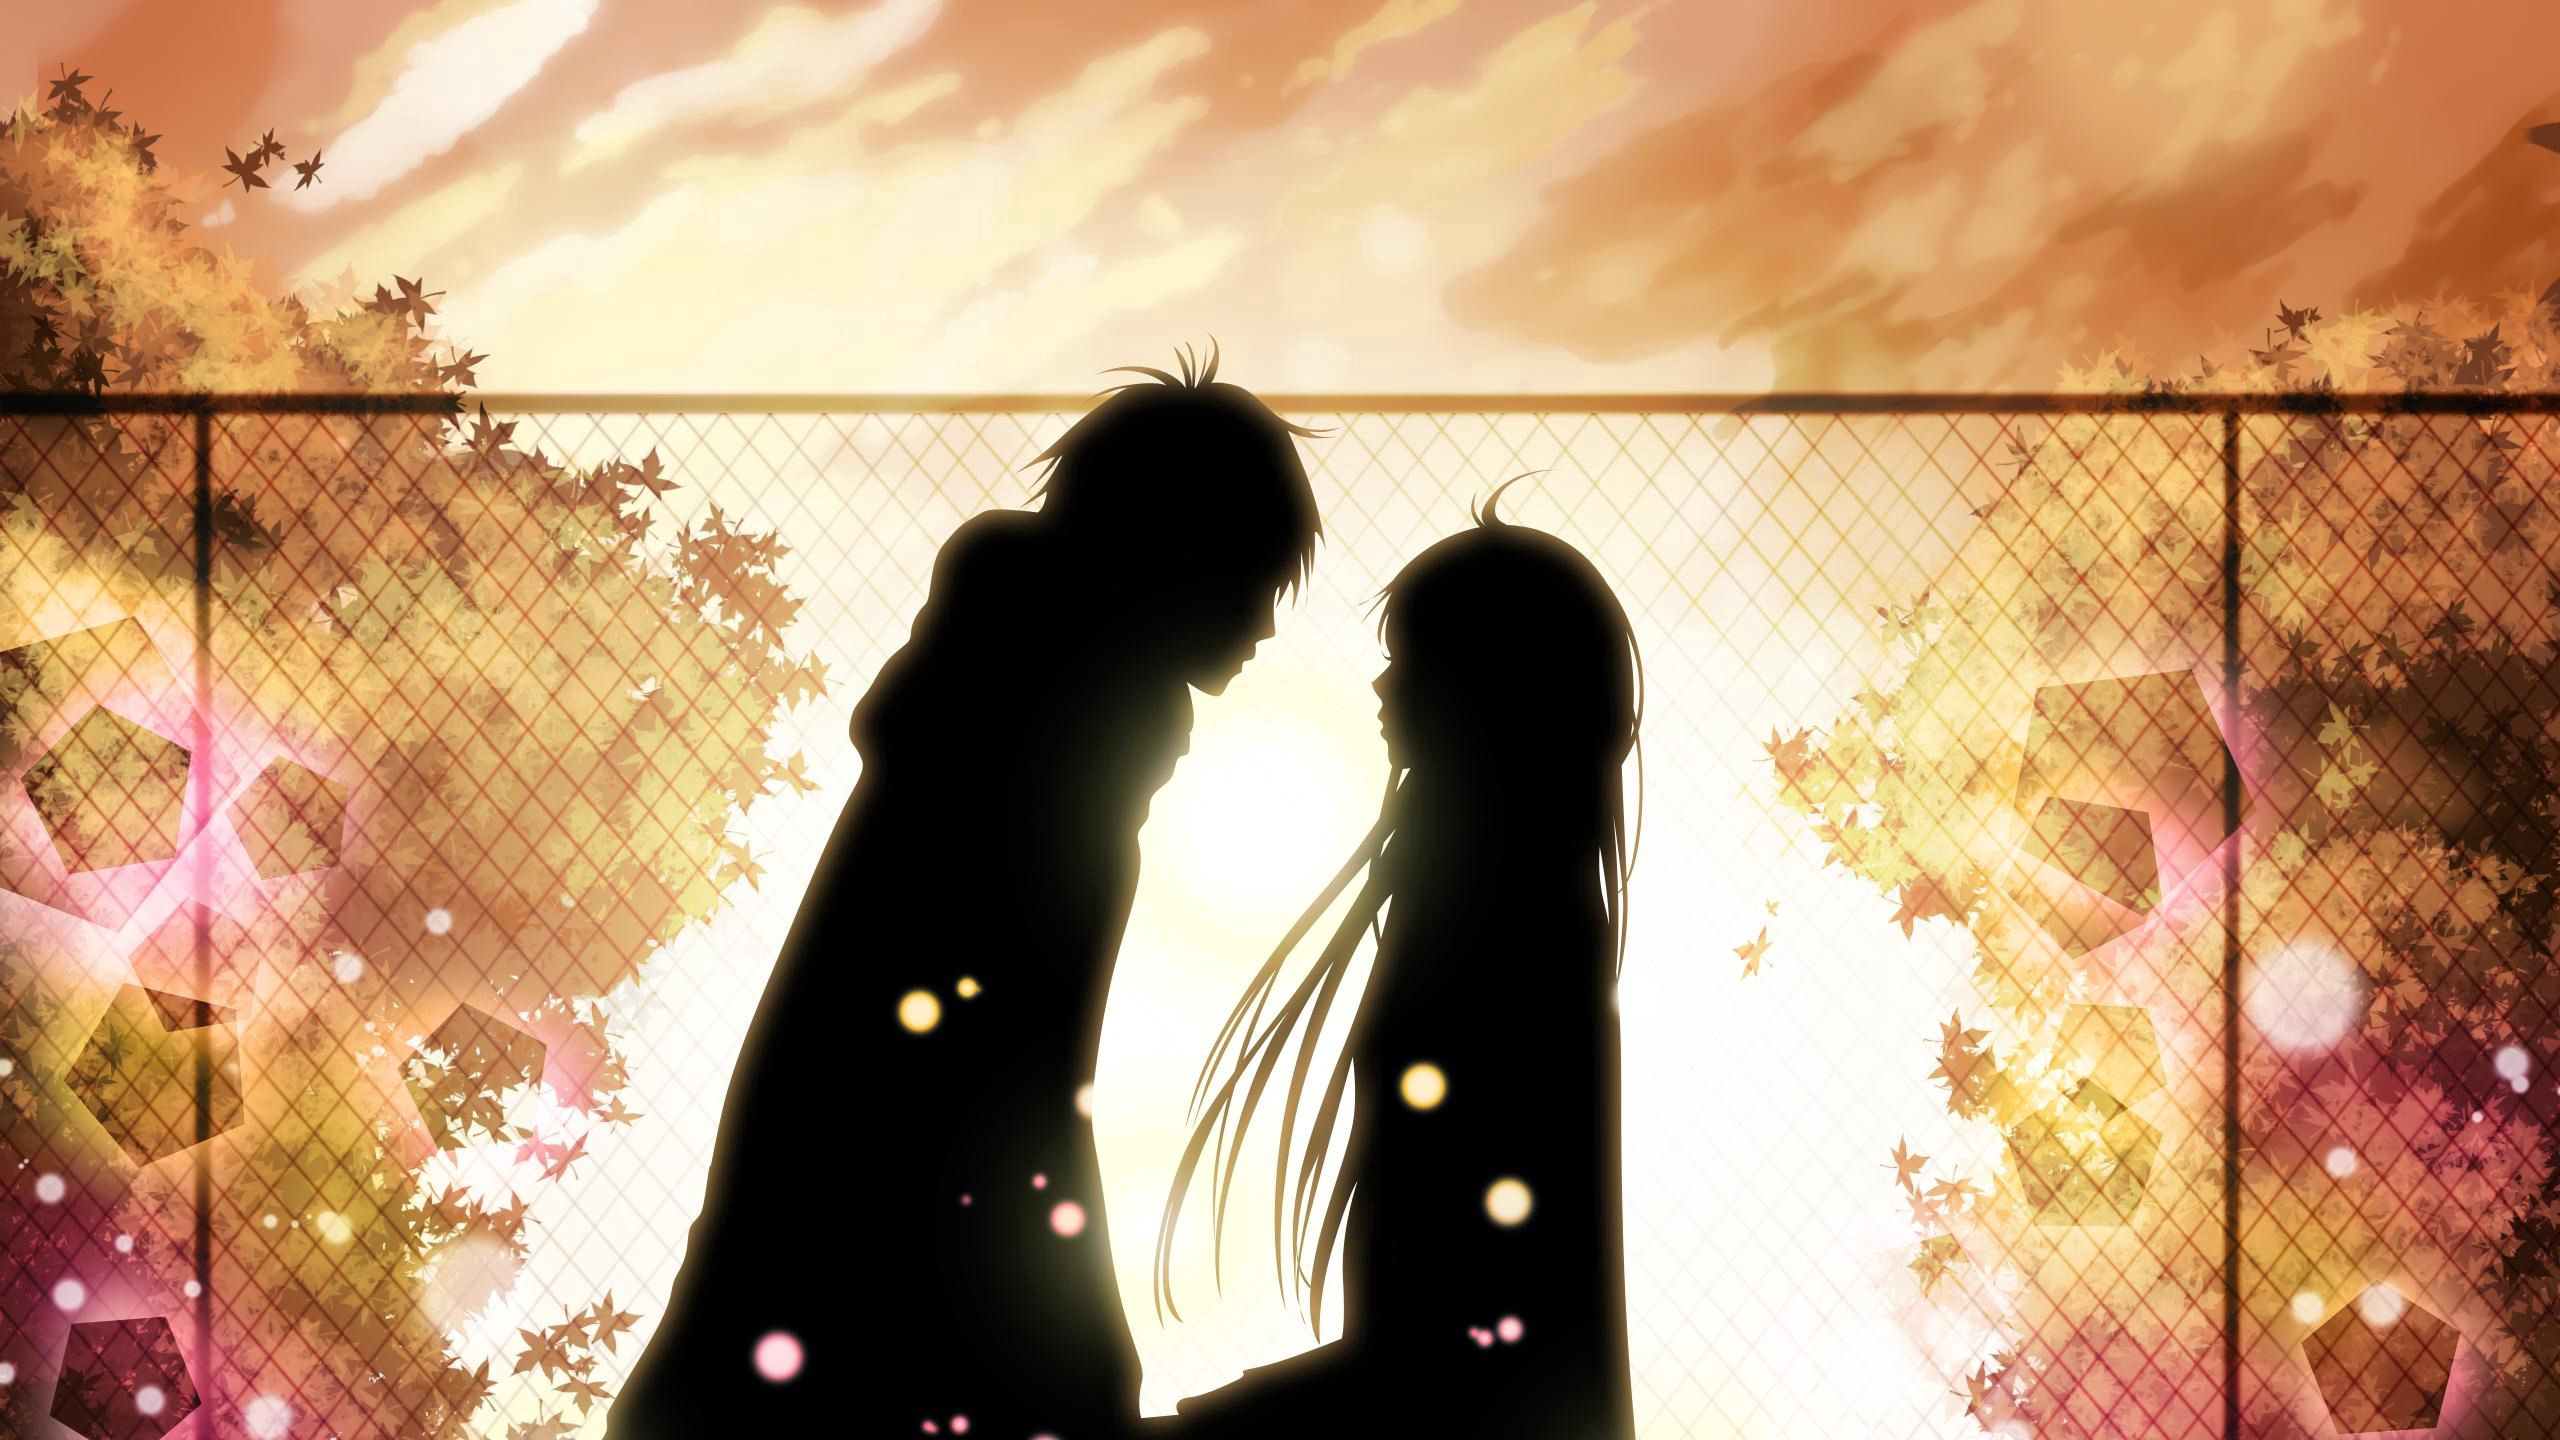 2560x1440 Wallpaper kimi ni todoke, girl, boy, love, feelings, meet, date, fall, leaves